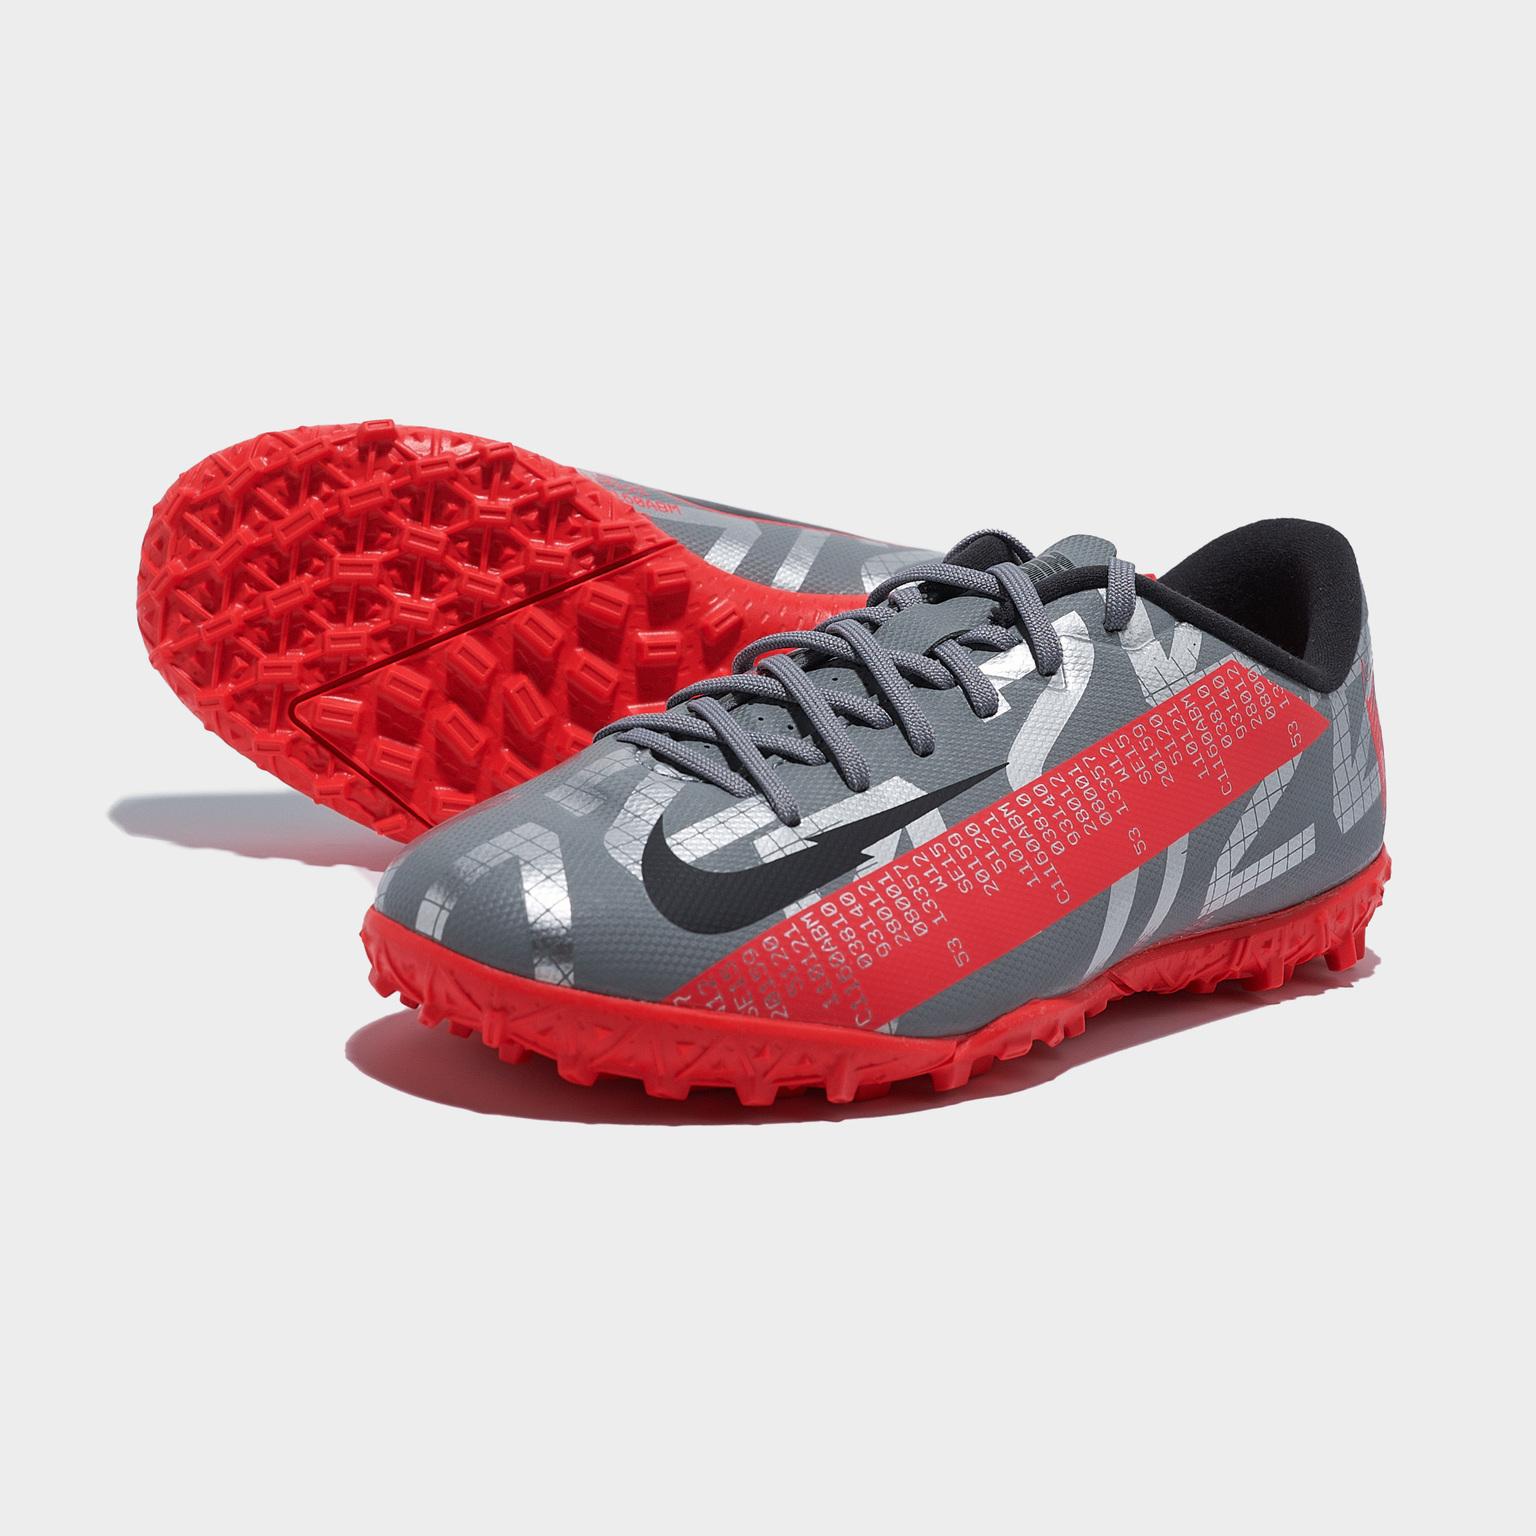 Фото - Шиповки детские Nike Vapor 13 Academy TF AT8145-906 шиповки детские nike vapor 13 academy neymar tf at8144 104